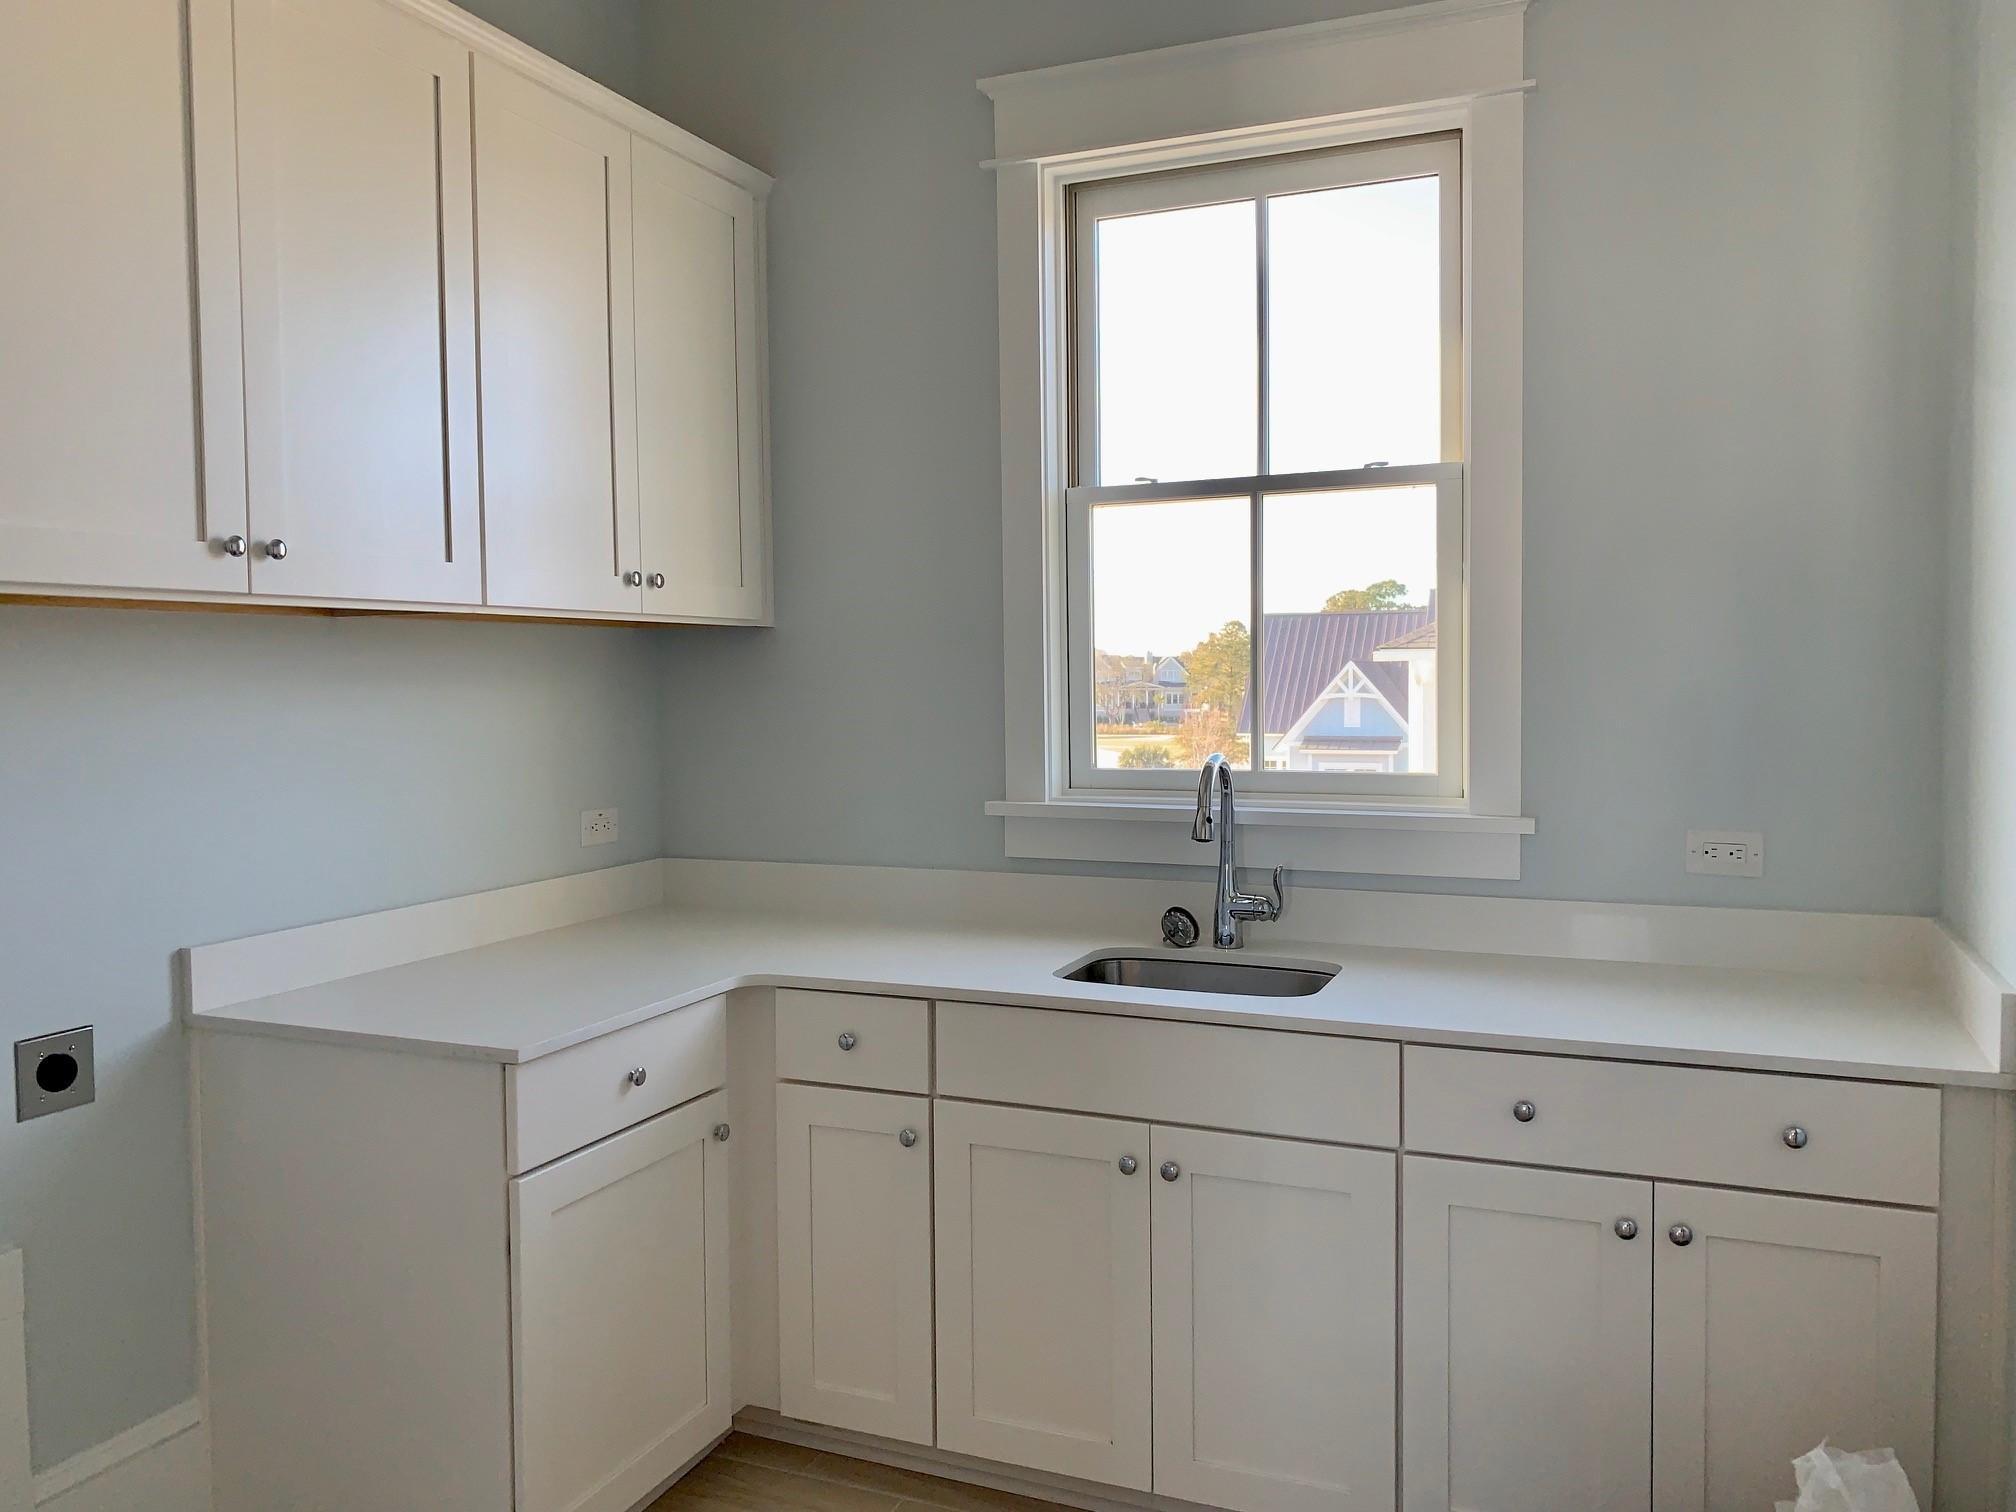 Daniel Island Homes For Sale - 206 Foundry, Charleston, SC - 15